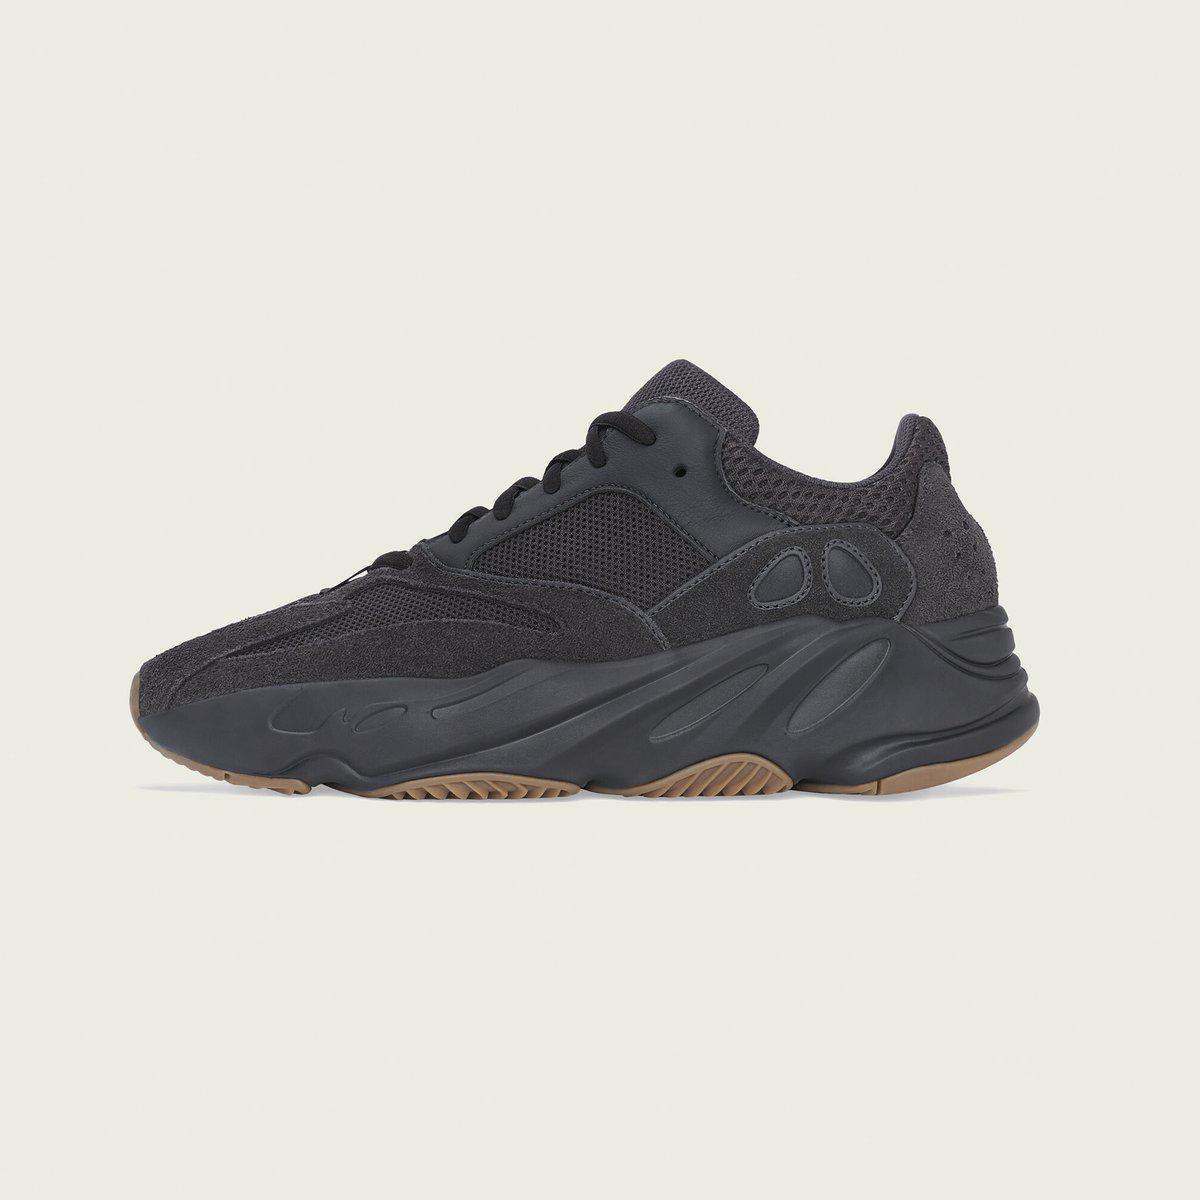 97d77e11271 adidas Yeezy Boost 700 V2 'Utility Black'06-29-2019